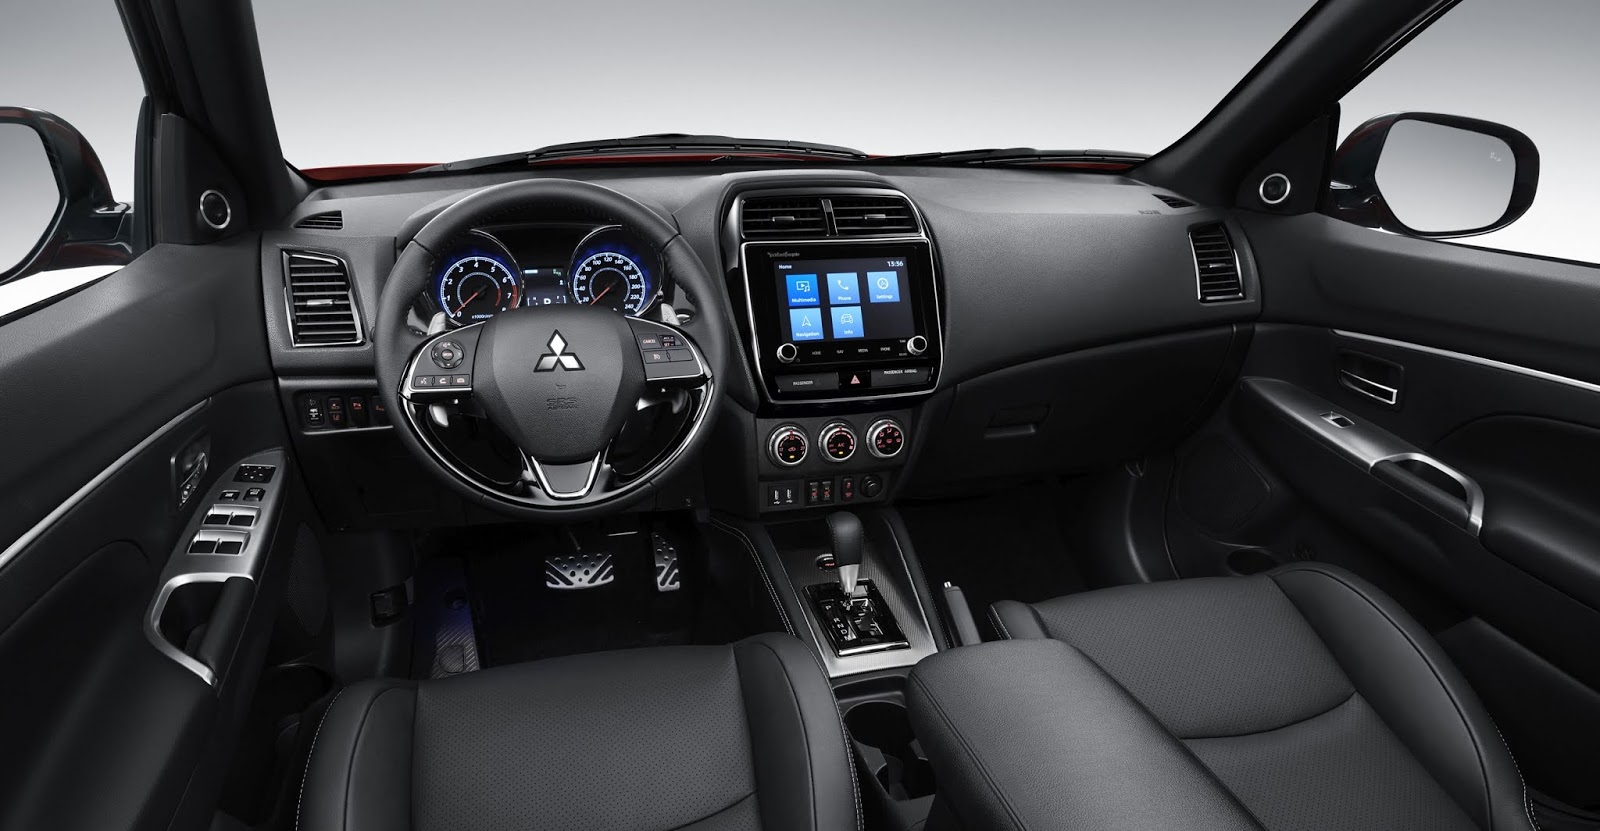 ASX2BMY20 04 Ιδού το Mitsubishi ASX 2020 Mitsubishi, Mitsubishi ASX, Mitsubishi Motors, Έκθεση Γενεύης